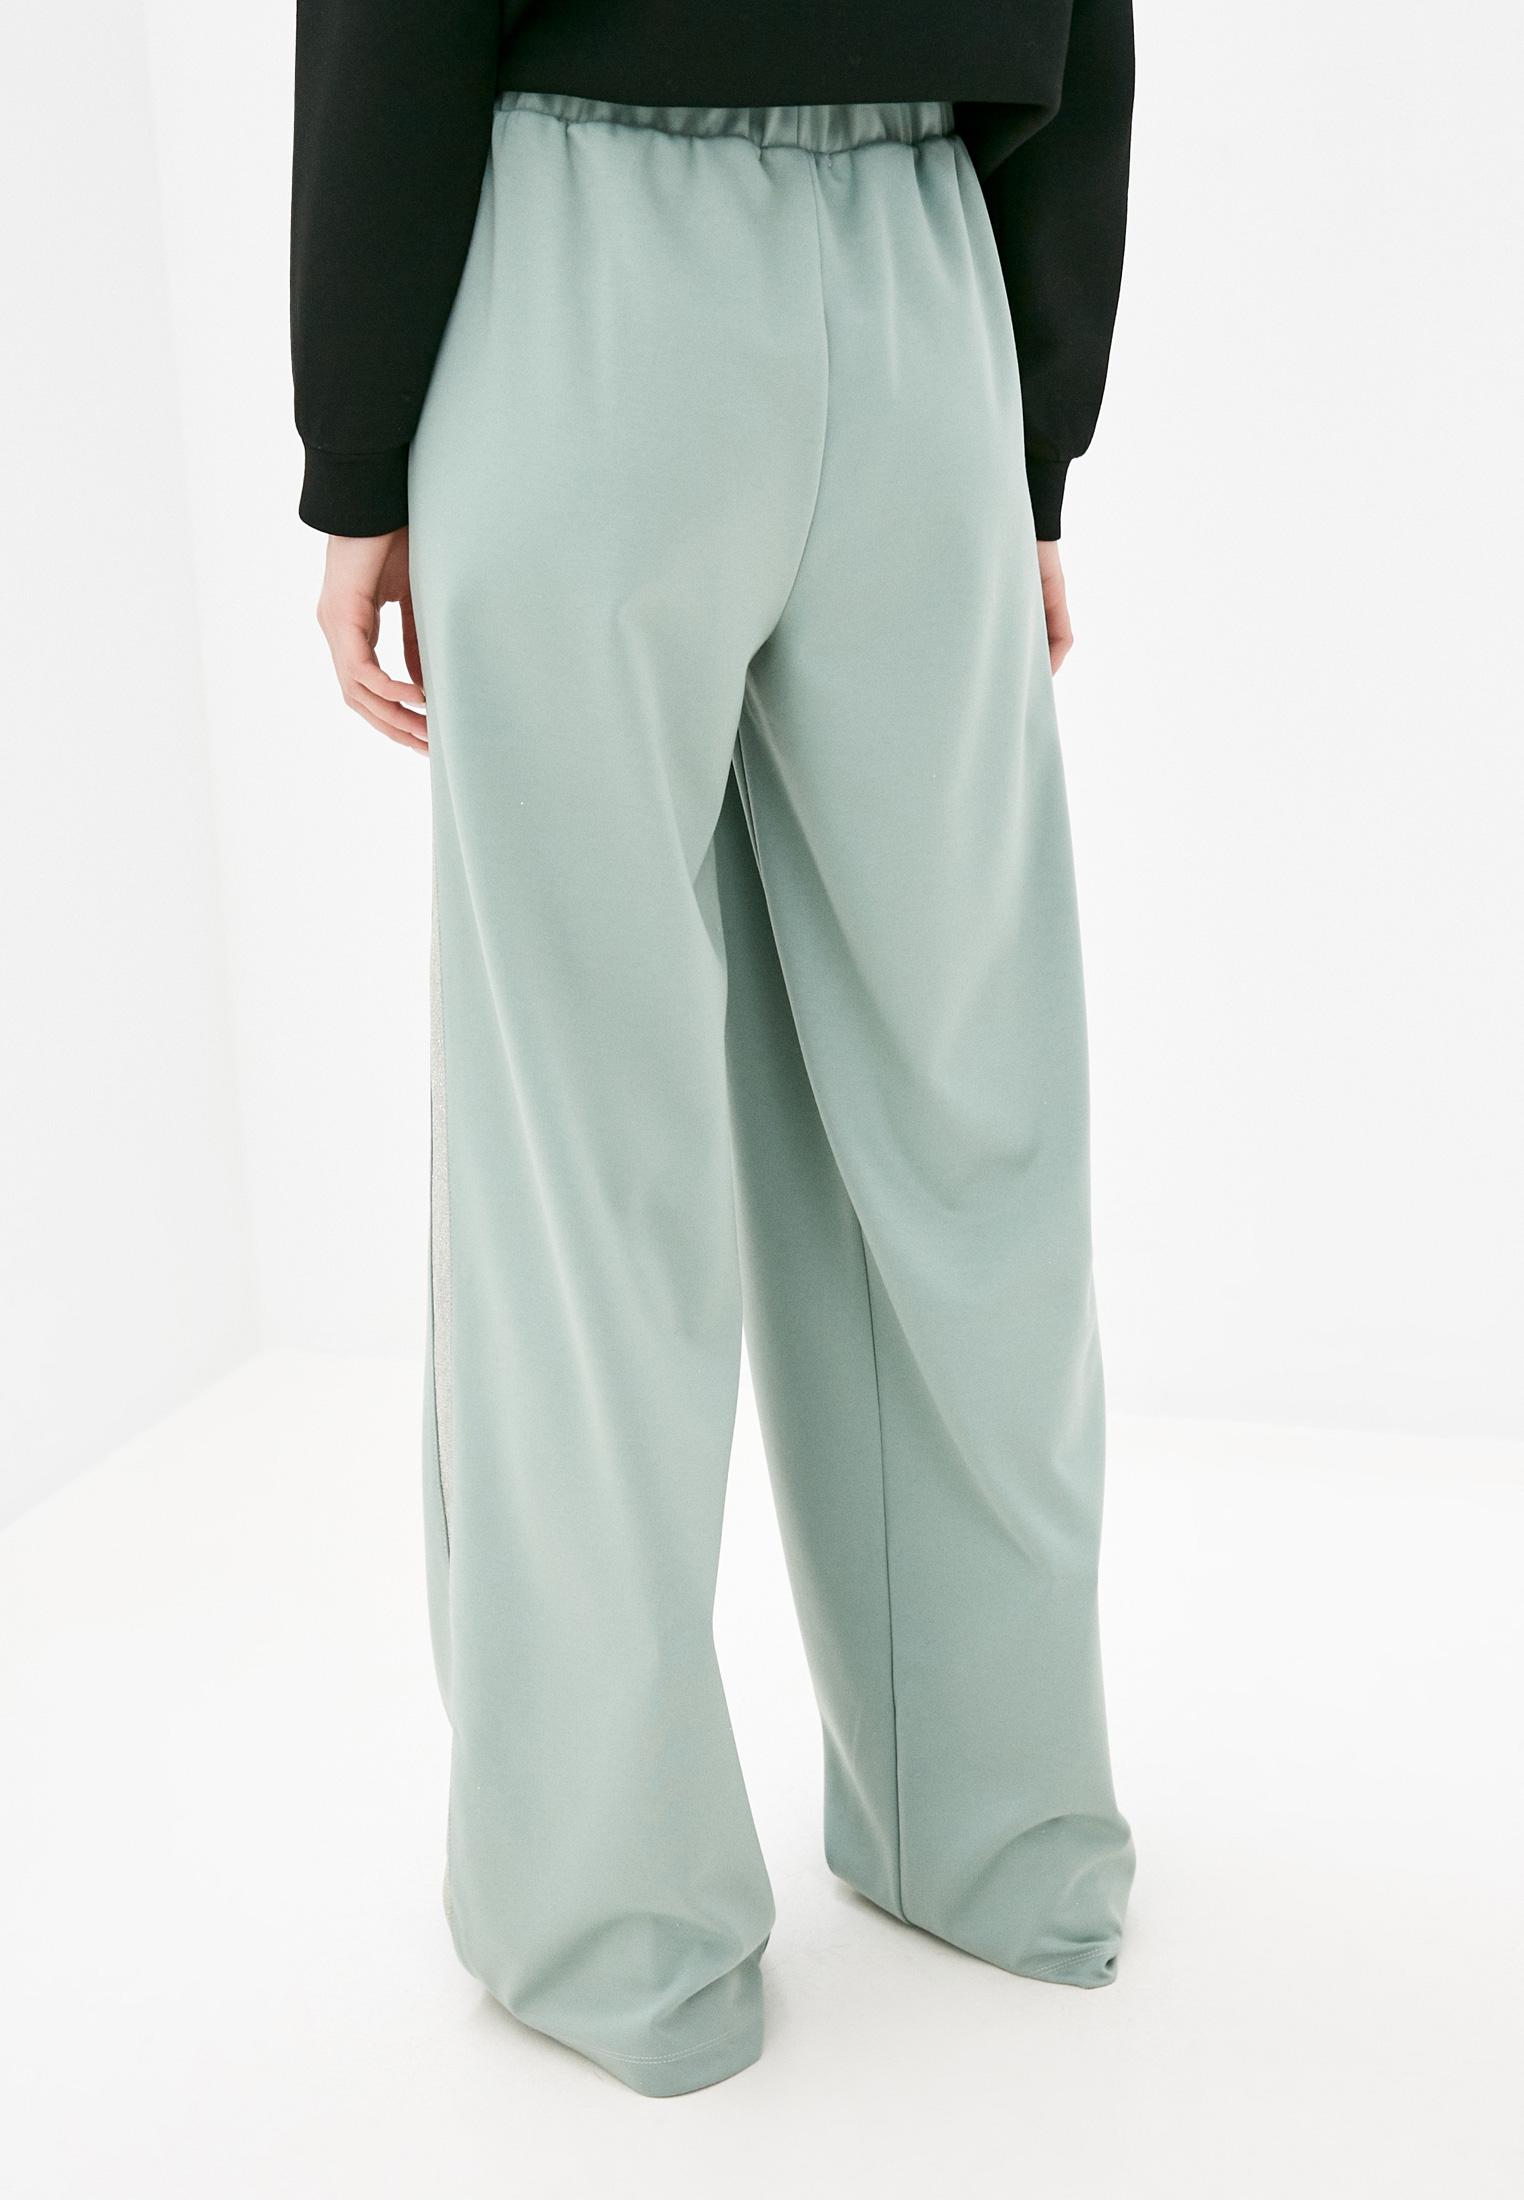 Женские брюки Nataliy Beate Брюки мод 509 а: изображение 3